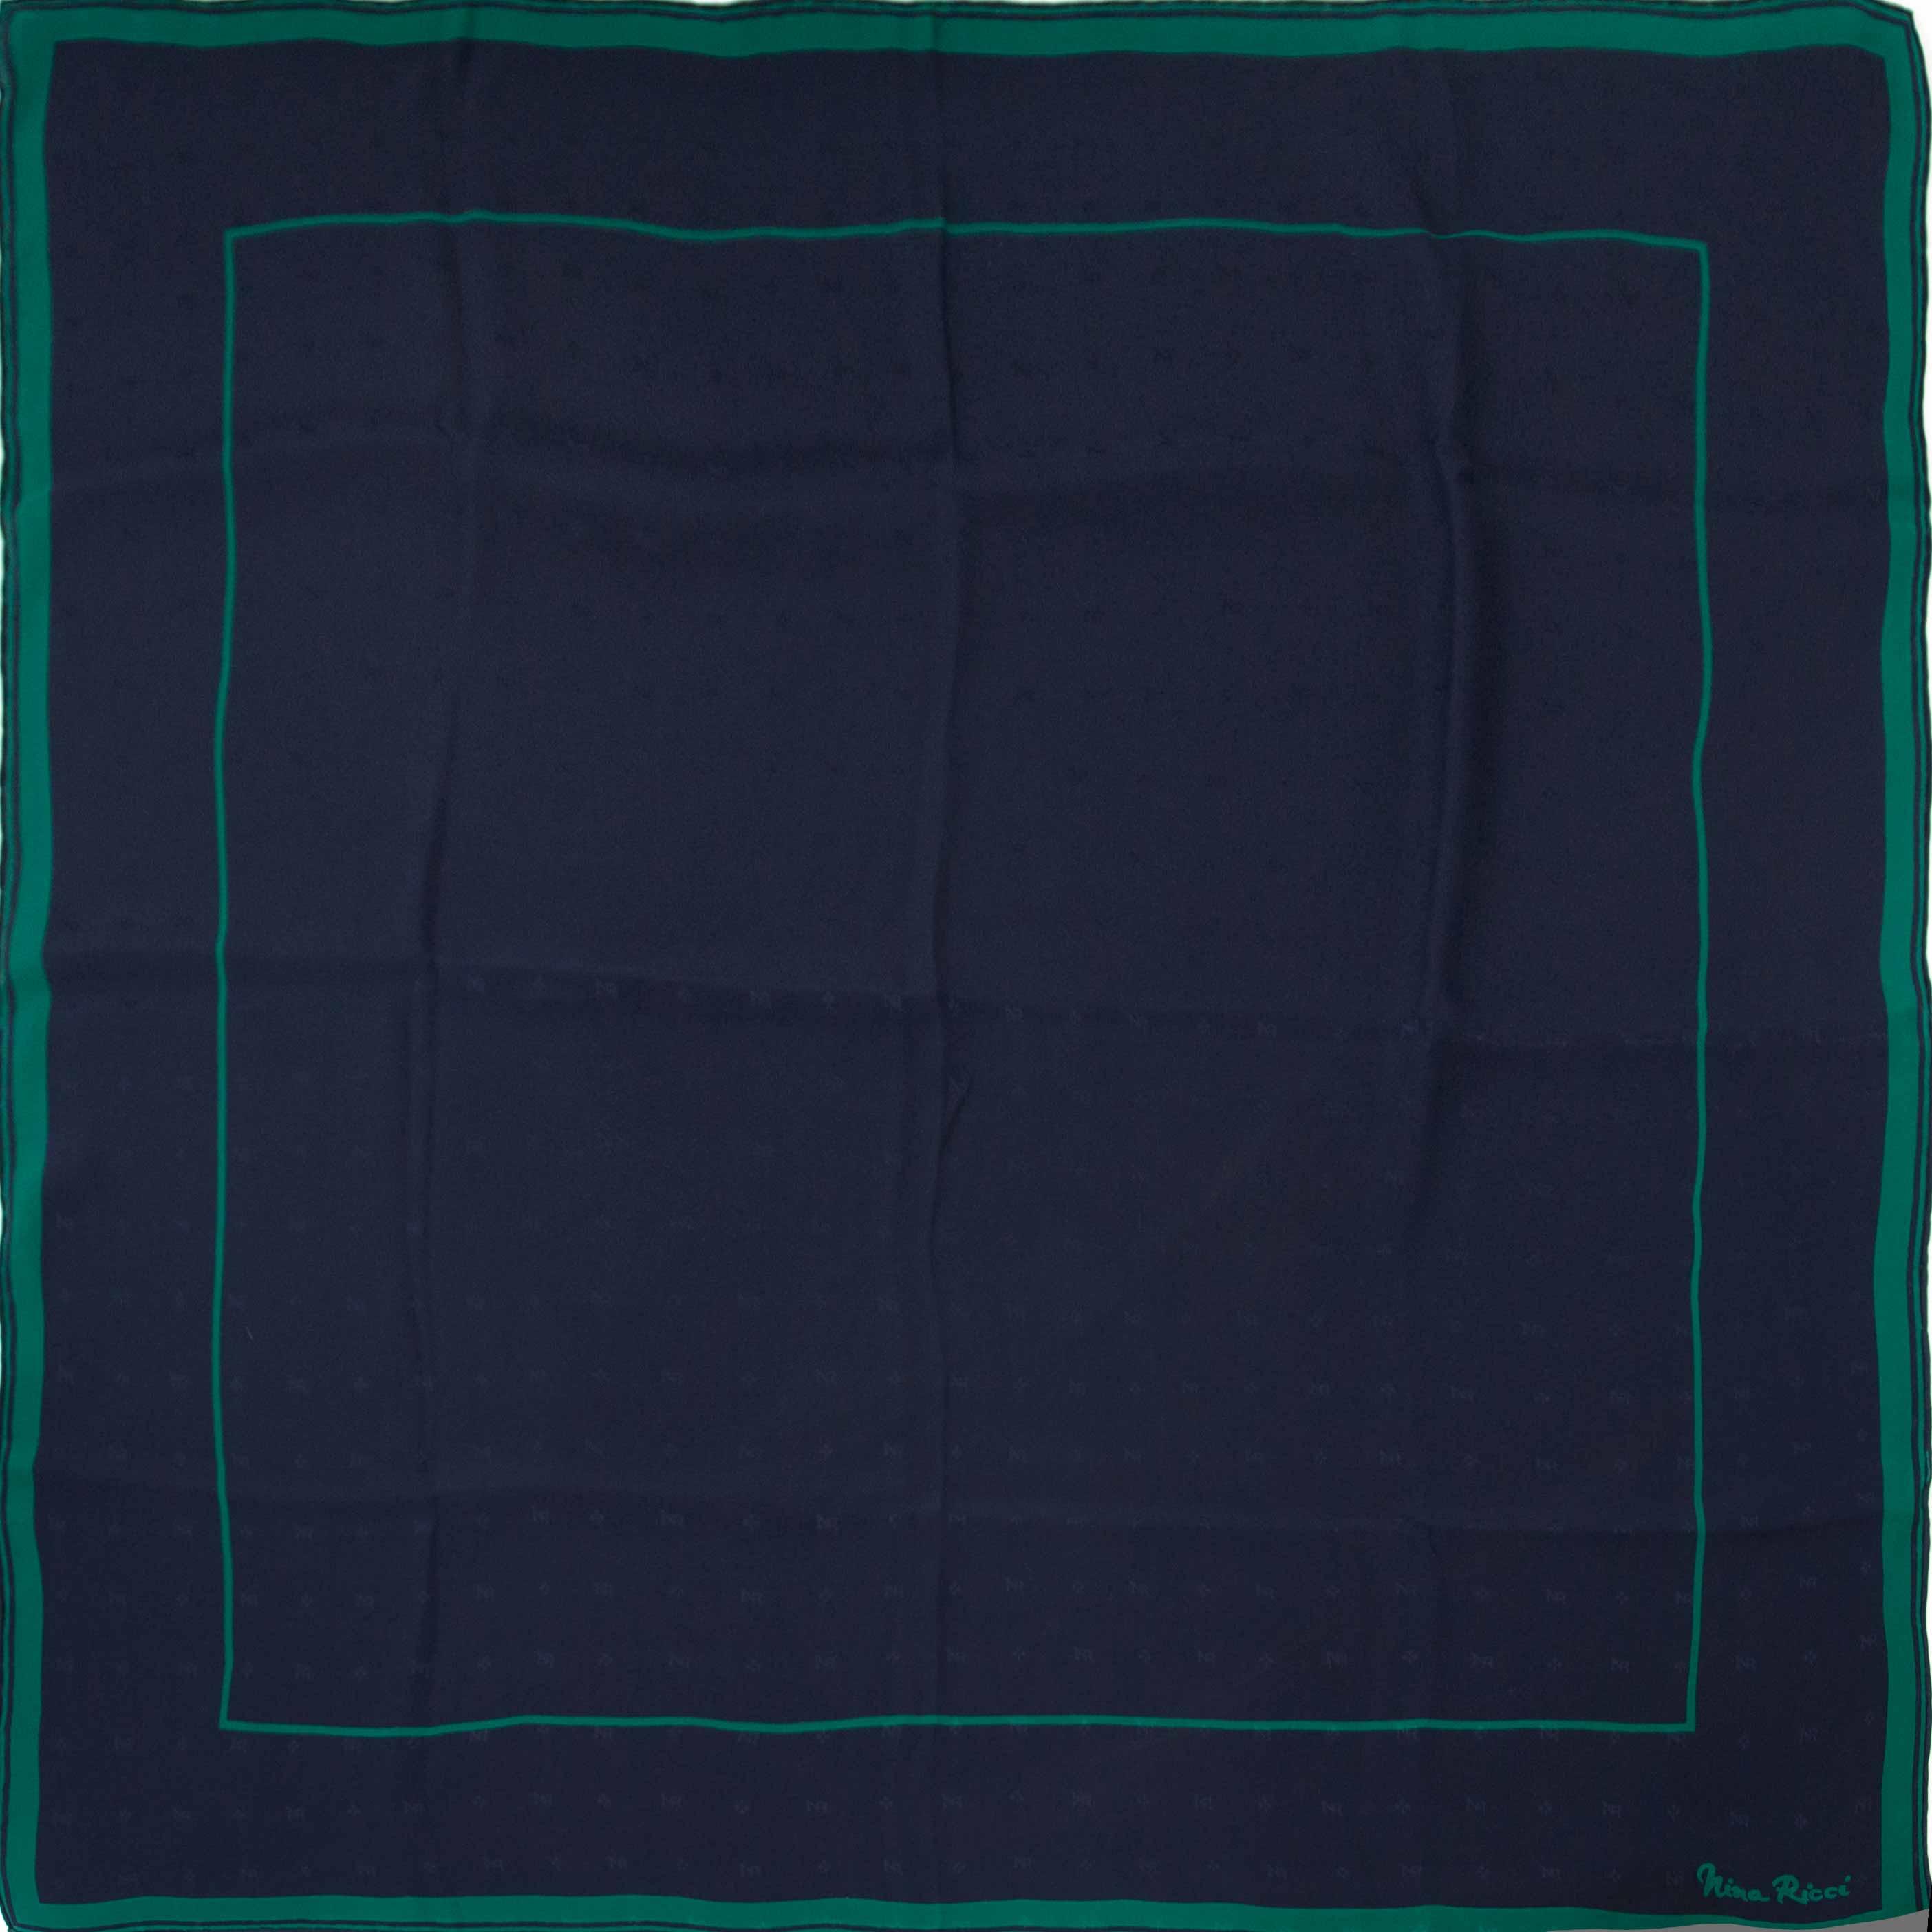 acheter en ligne seconde main Nina Ricci Blue And Green Scarf